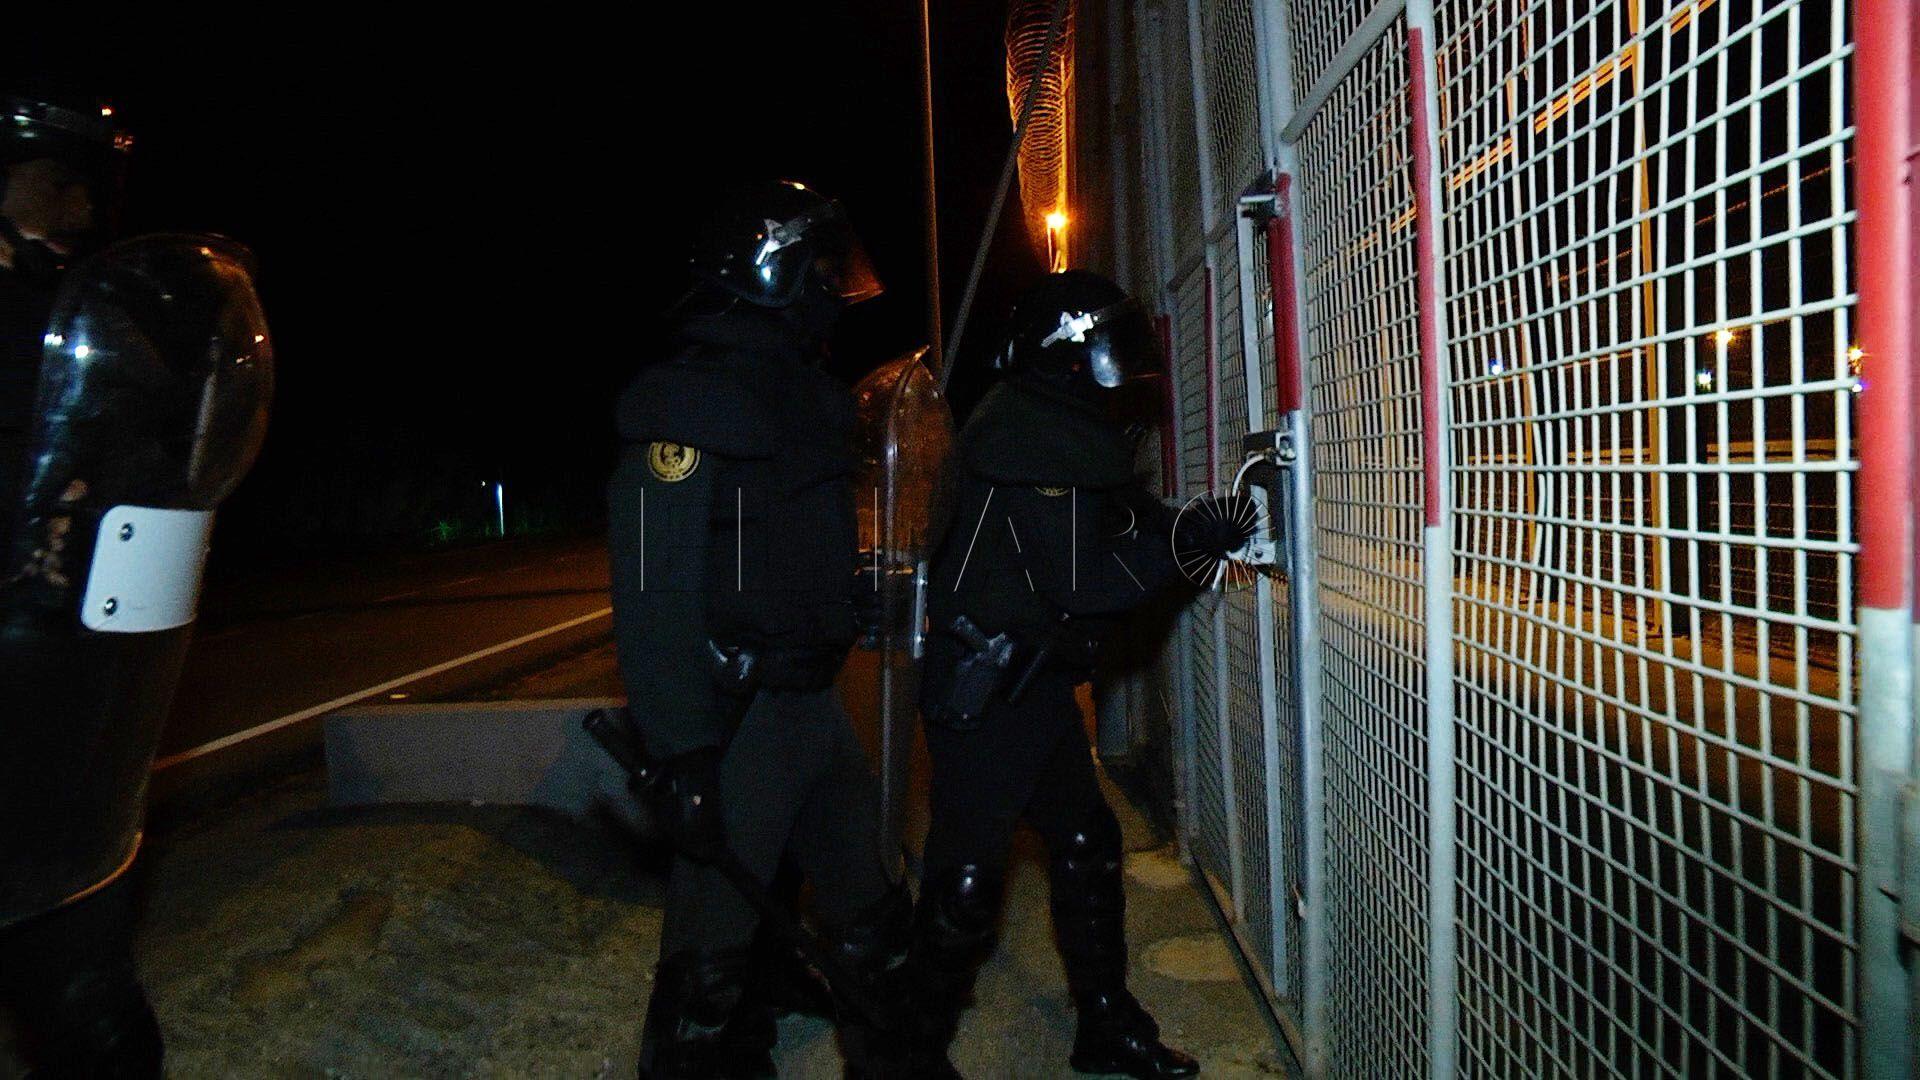 https://elfarodeceuta.es/wp-content/uploads/2019/06/guardia-civil-ceuta-grs-usecic-3.jpg